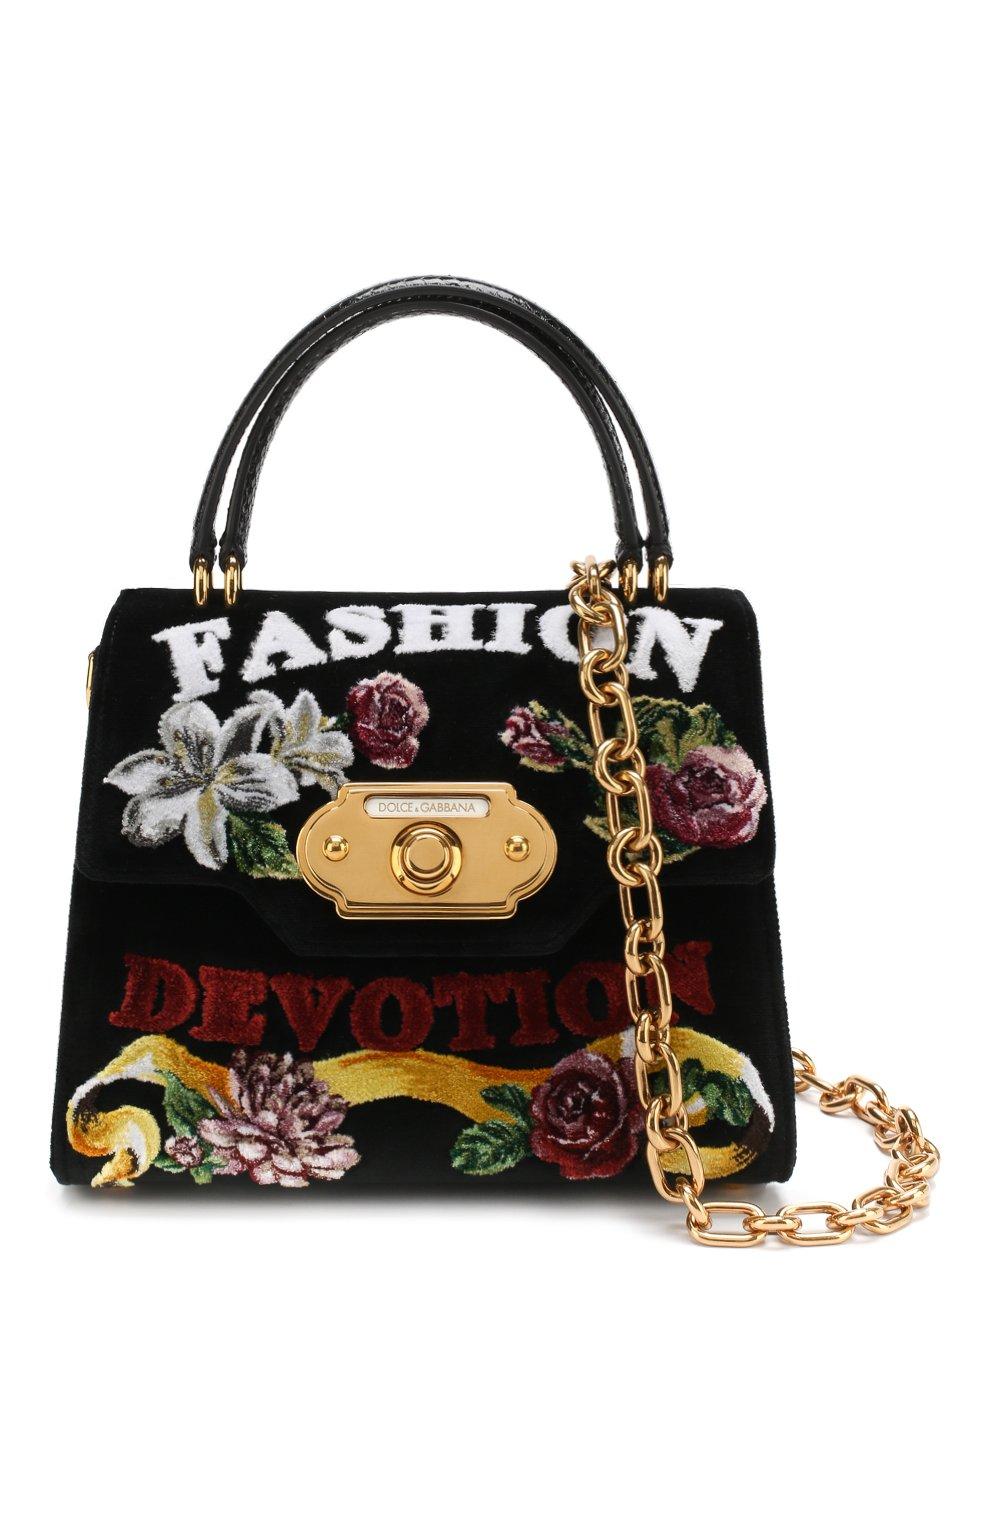 7b0b559113f8 Женская сумка welcome medium из бархата DOLCE & GABBANA черная цвета ...